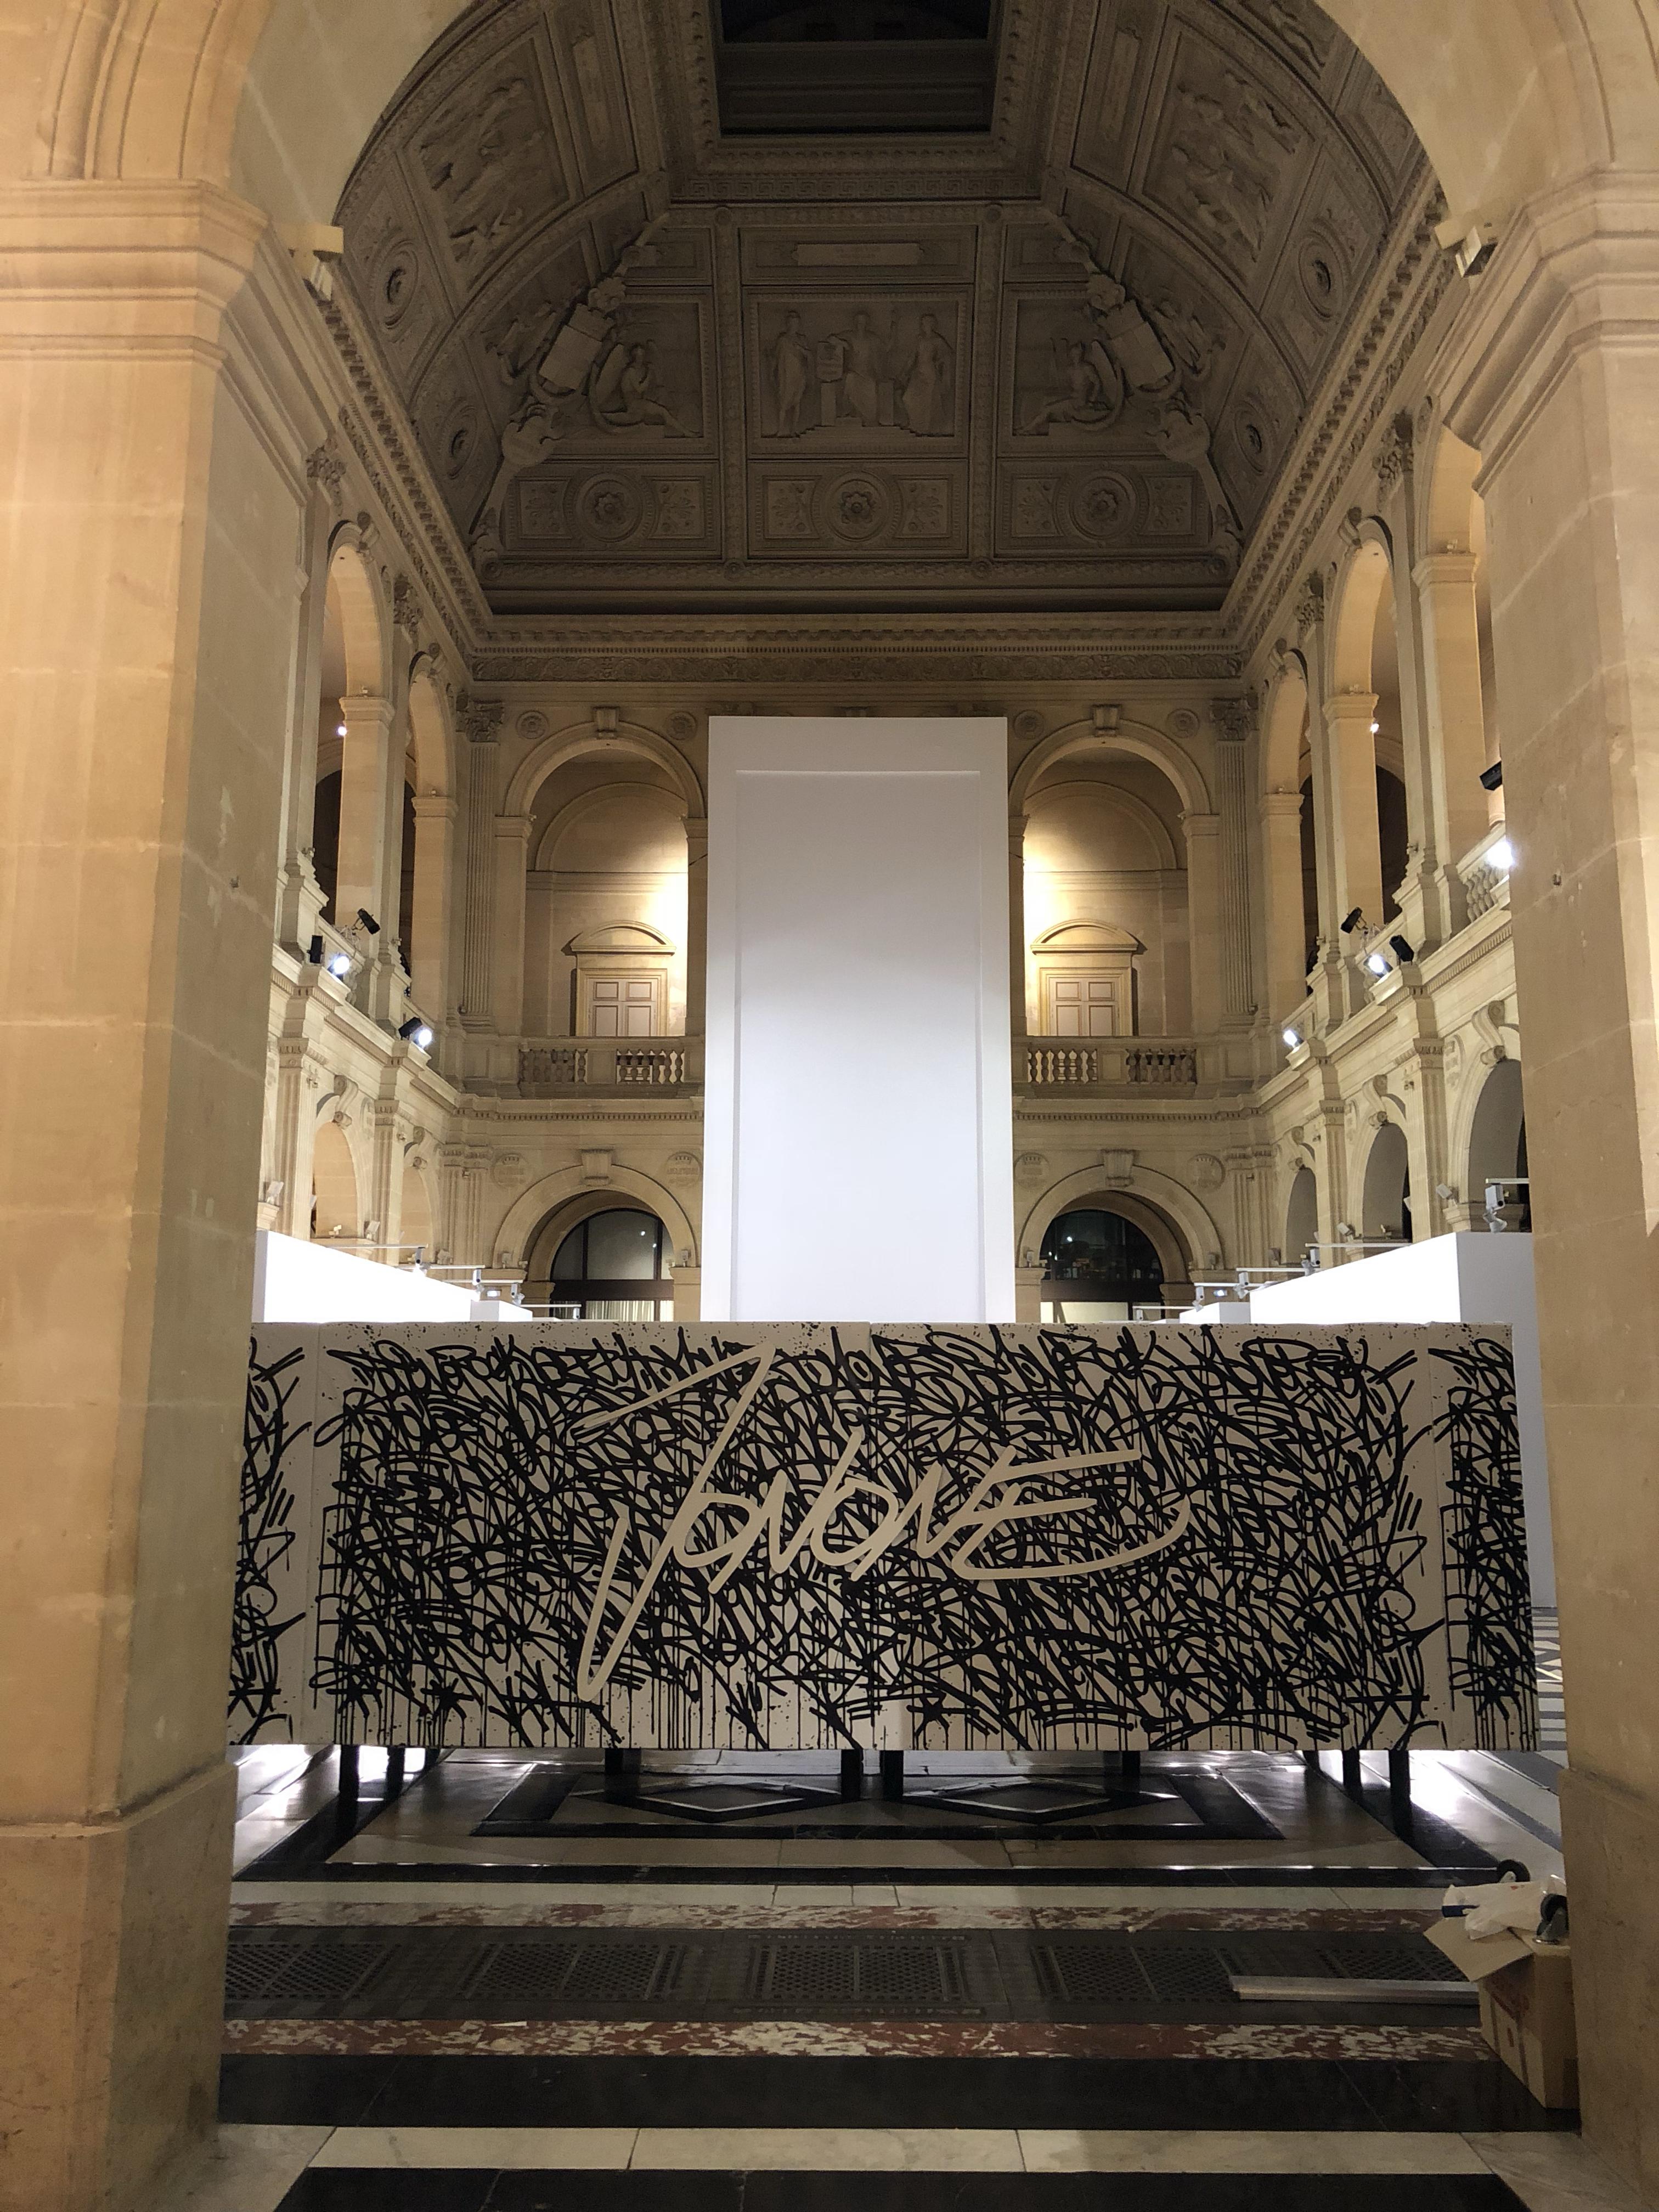 Canape-JonOne-Aucop-Event-Evenement-Marseille-Expo-Art-Abstracted-Love-evenementiel-palaisdelabourse-audiovisuel-peinture-oeuvres-galerie-david-pluskwa-contemporain-vernissage-deco-decoration